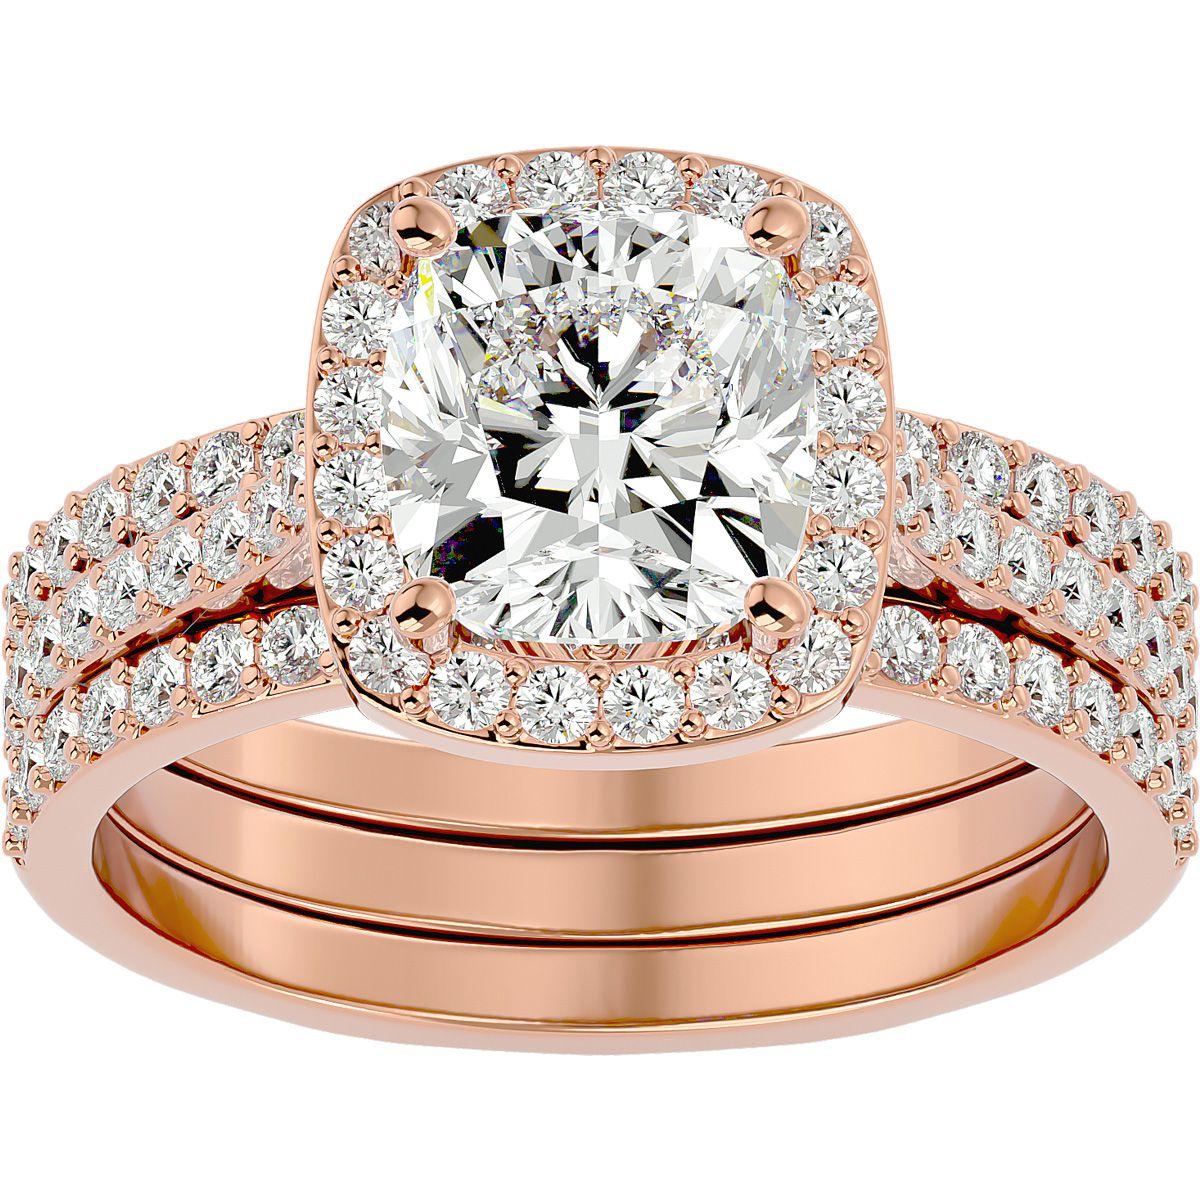 3 1/4 Carat Cushion Cut Halo Diamond Bridal Engagement Ring Set in 14K Rose Gold (16 g) (